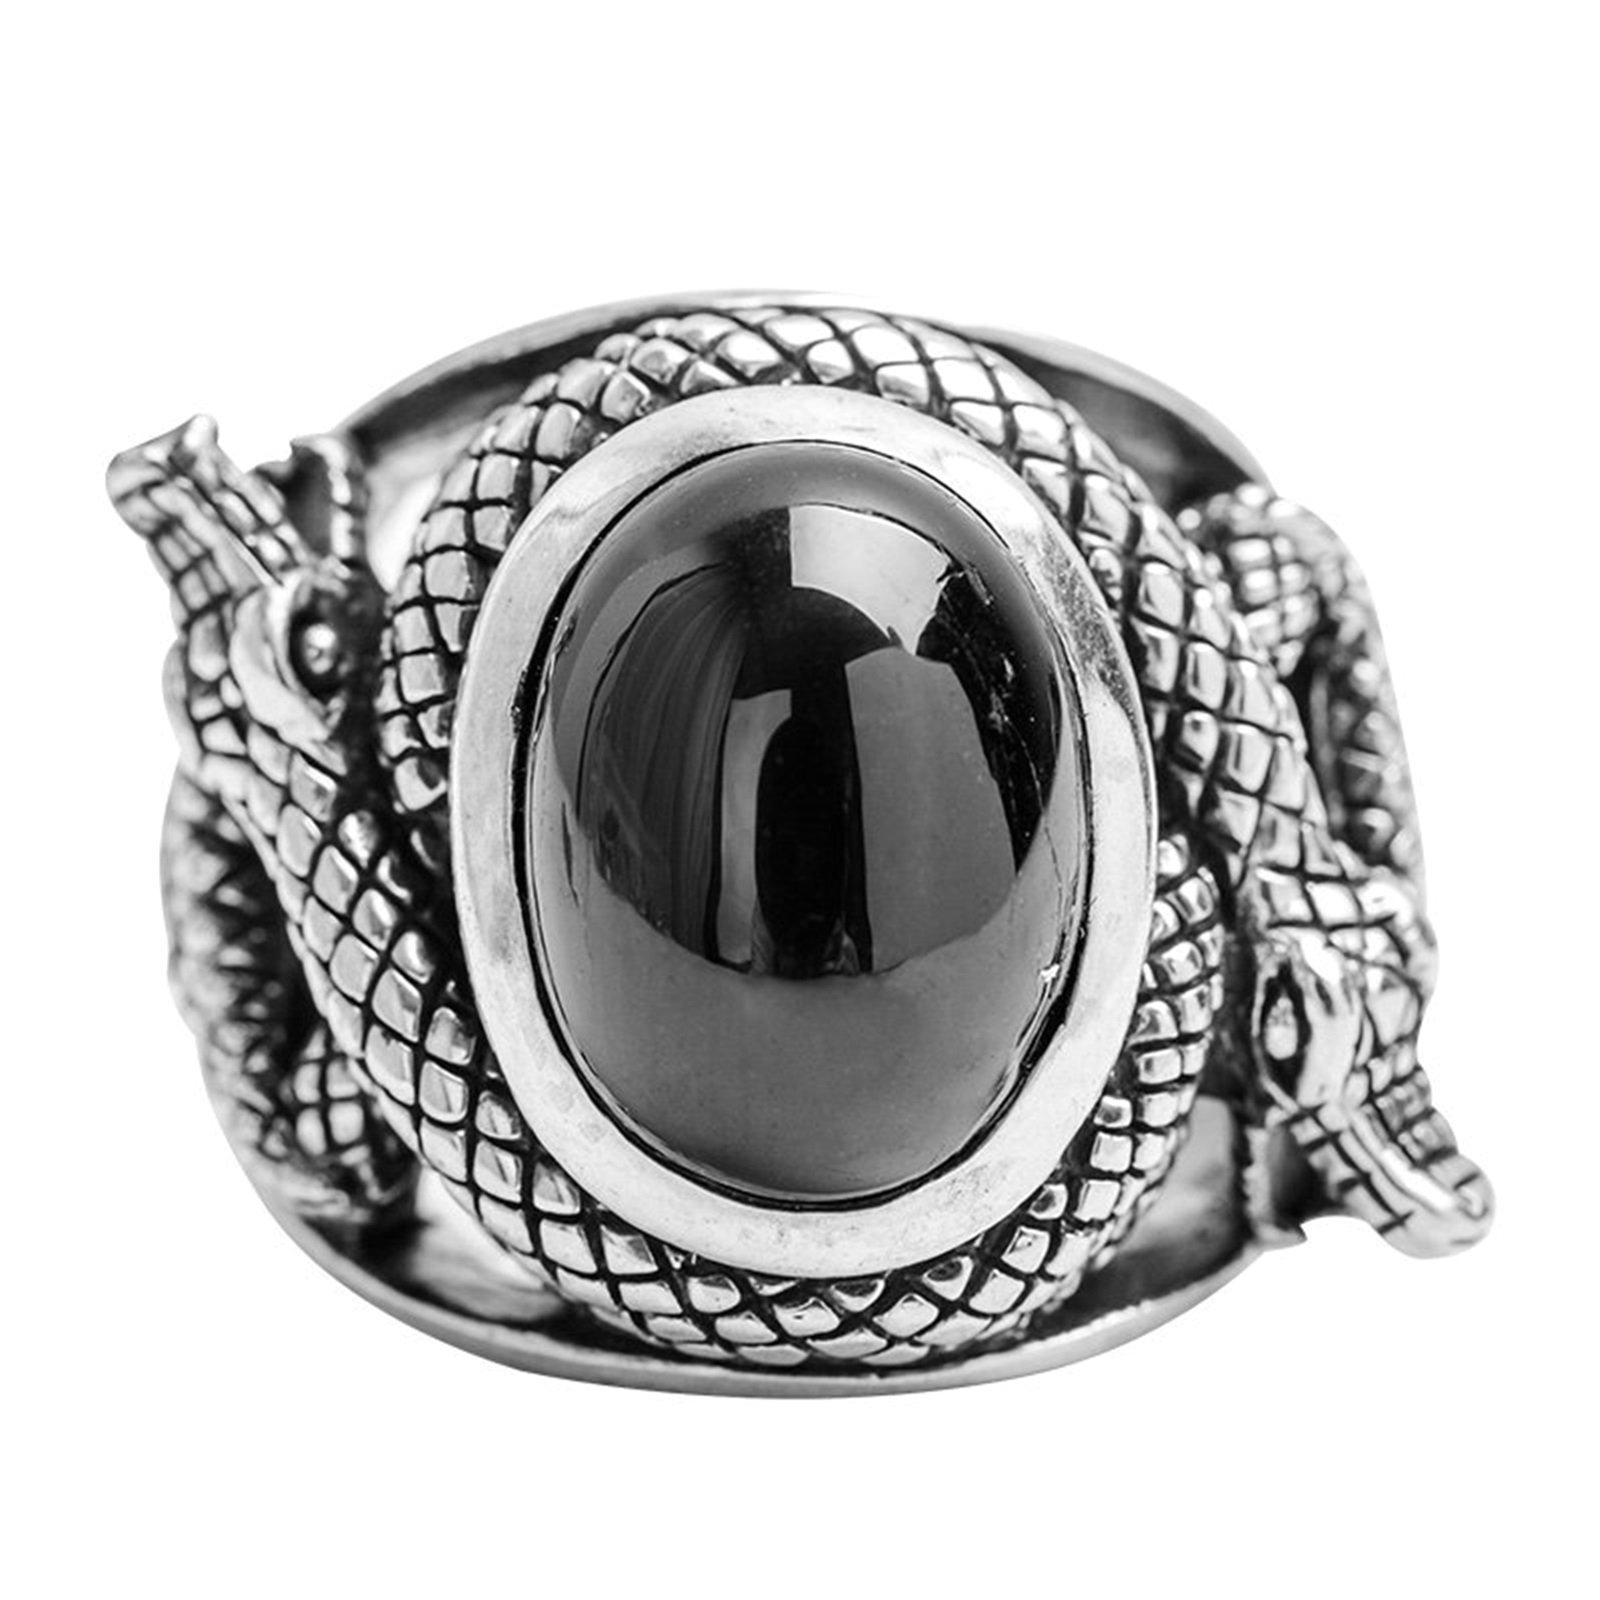 Epinki 925 Sterling Silver Punk Rock Vintage Gothic Black Onyx Two Snake Ring for Men Size 10 by Epinki